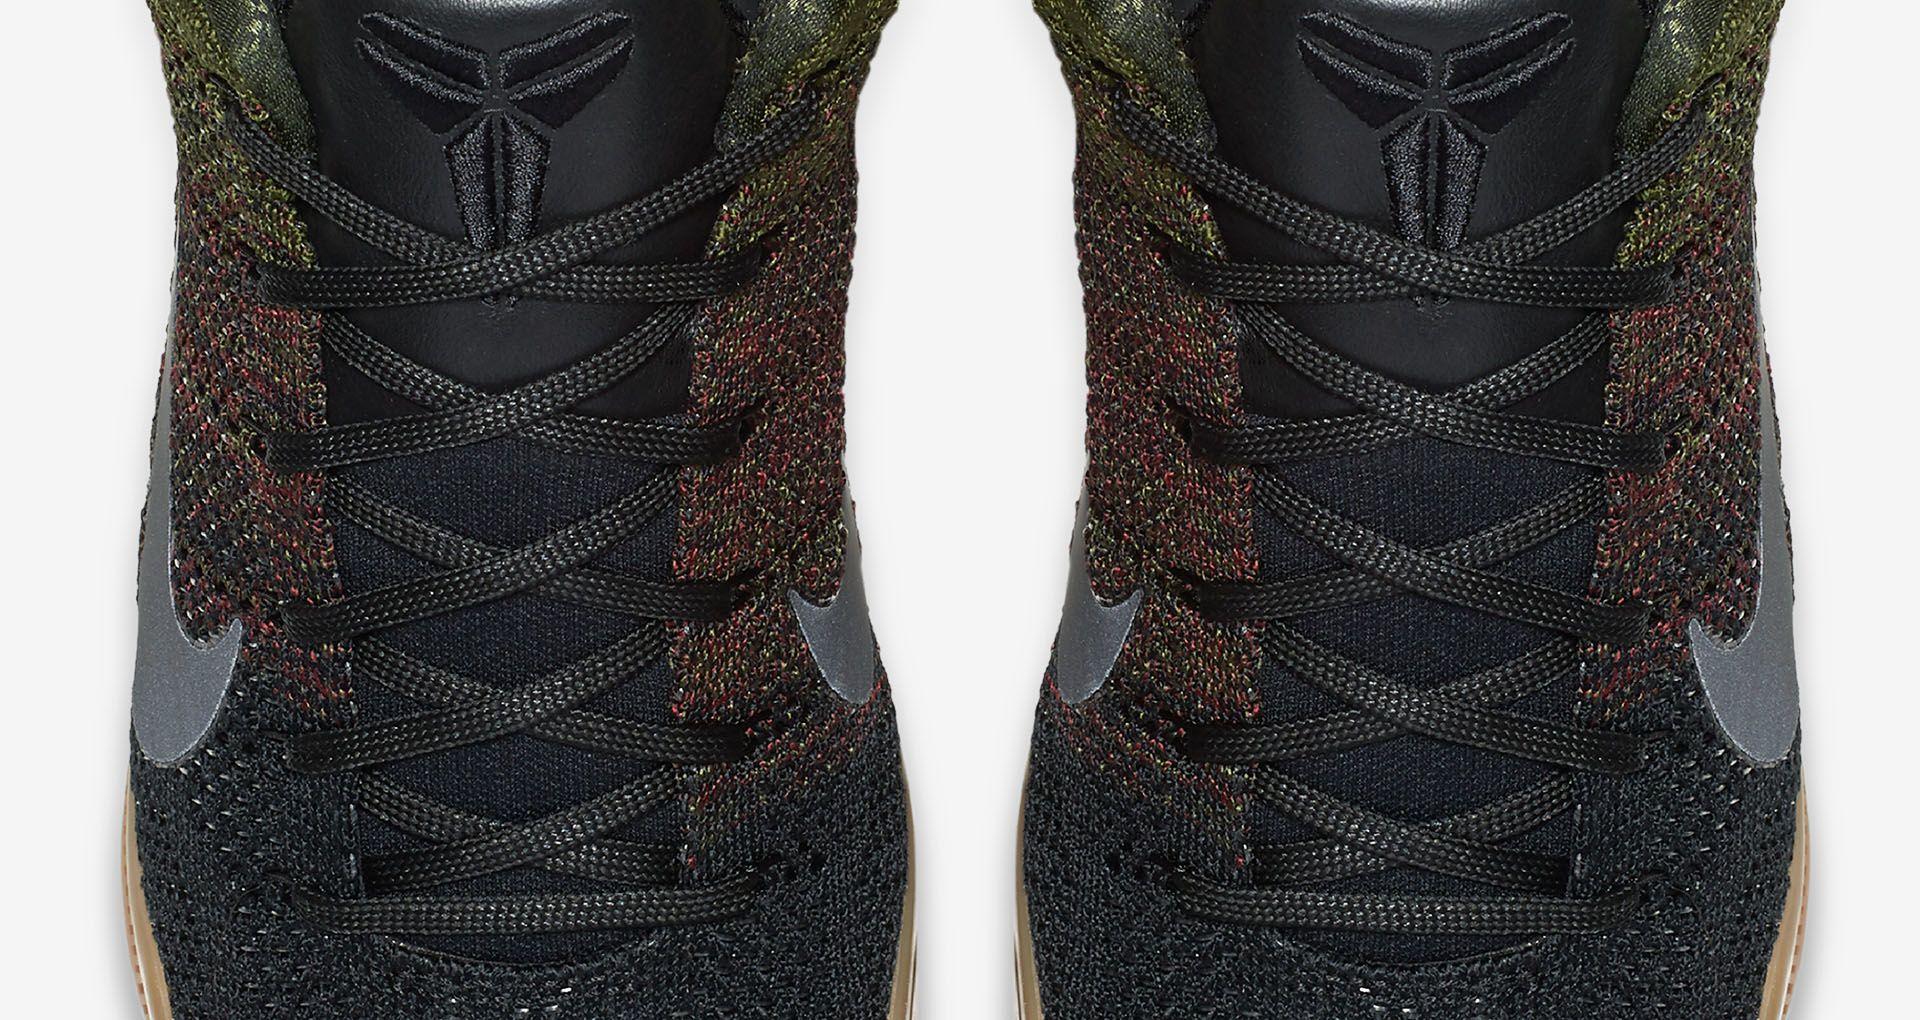 reputable site 403ff 78975 Nike Kobe 11 Elite Low  Black Horse  Release Date